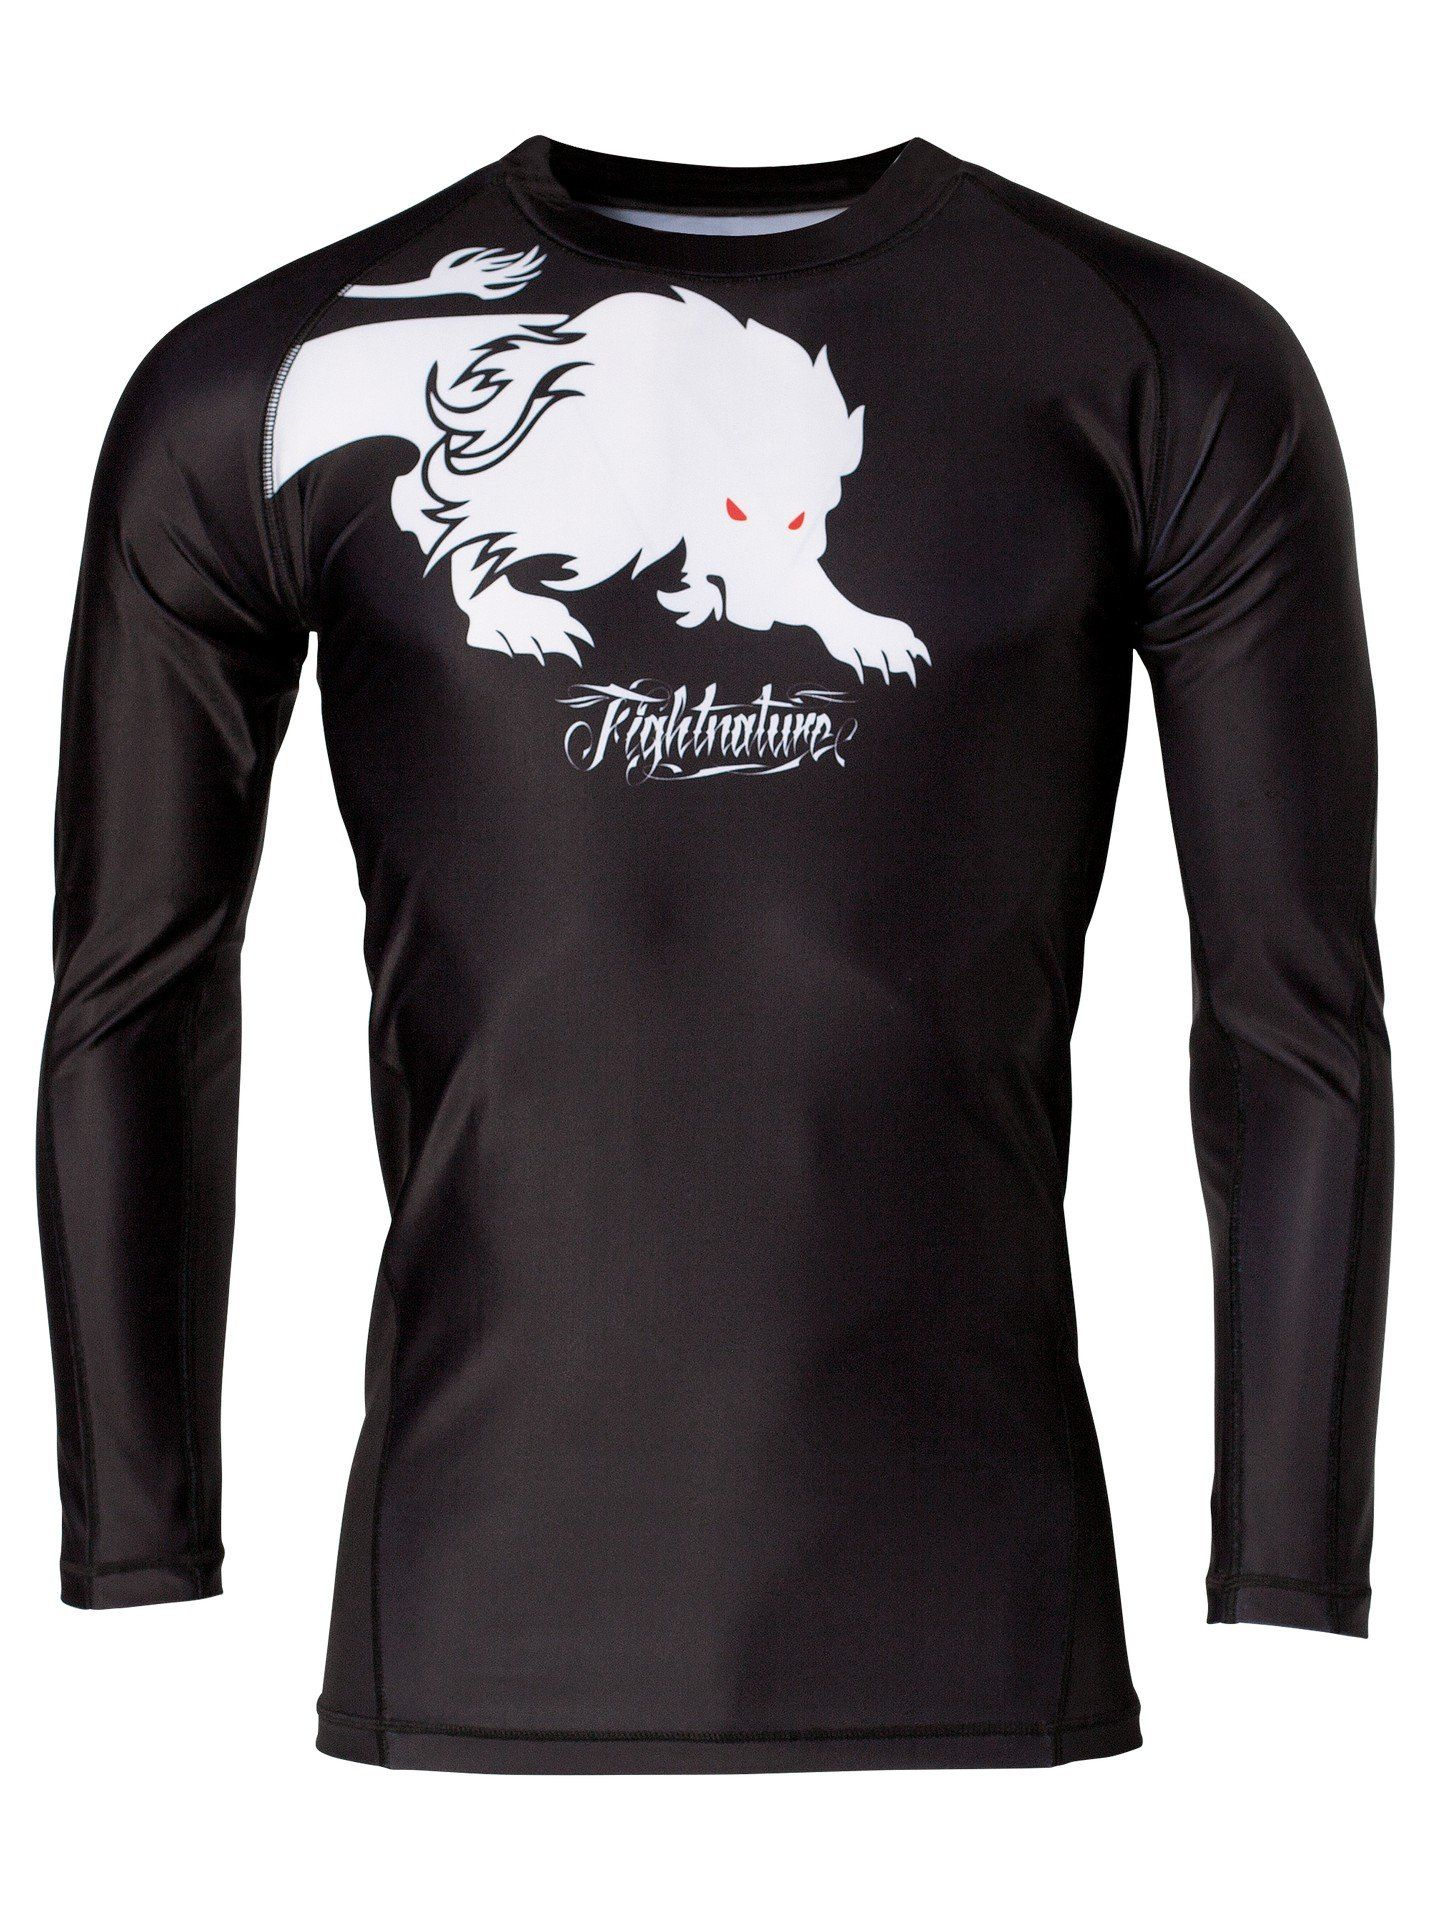 379361b06505 Long Sleeve Compression Shirts Amazon